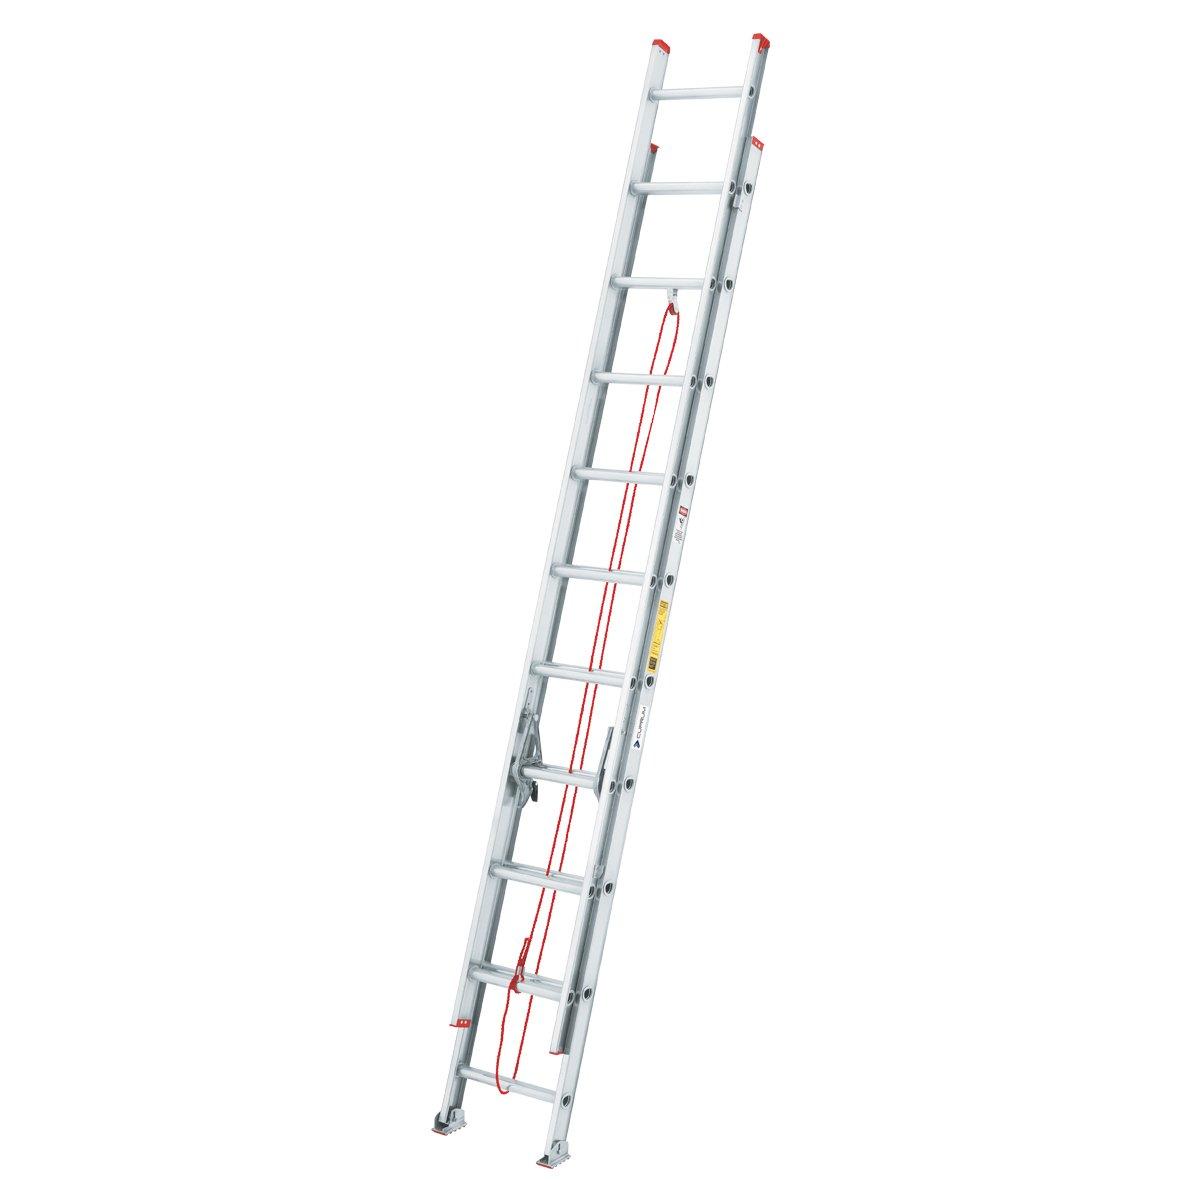 Escalera de extension cuprum mod 494 20 sears com mx for Escalera de 4 metros